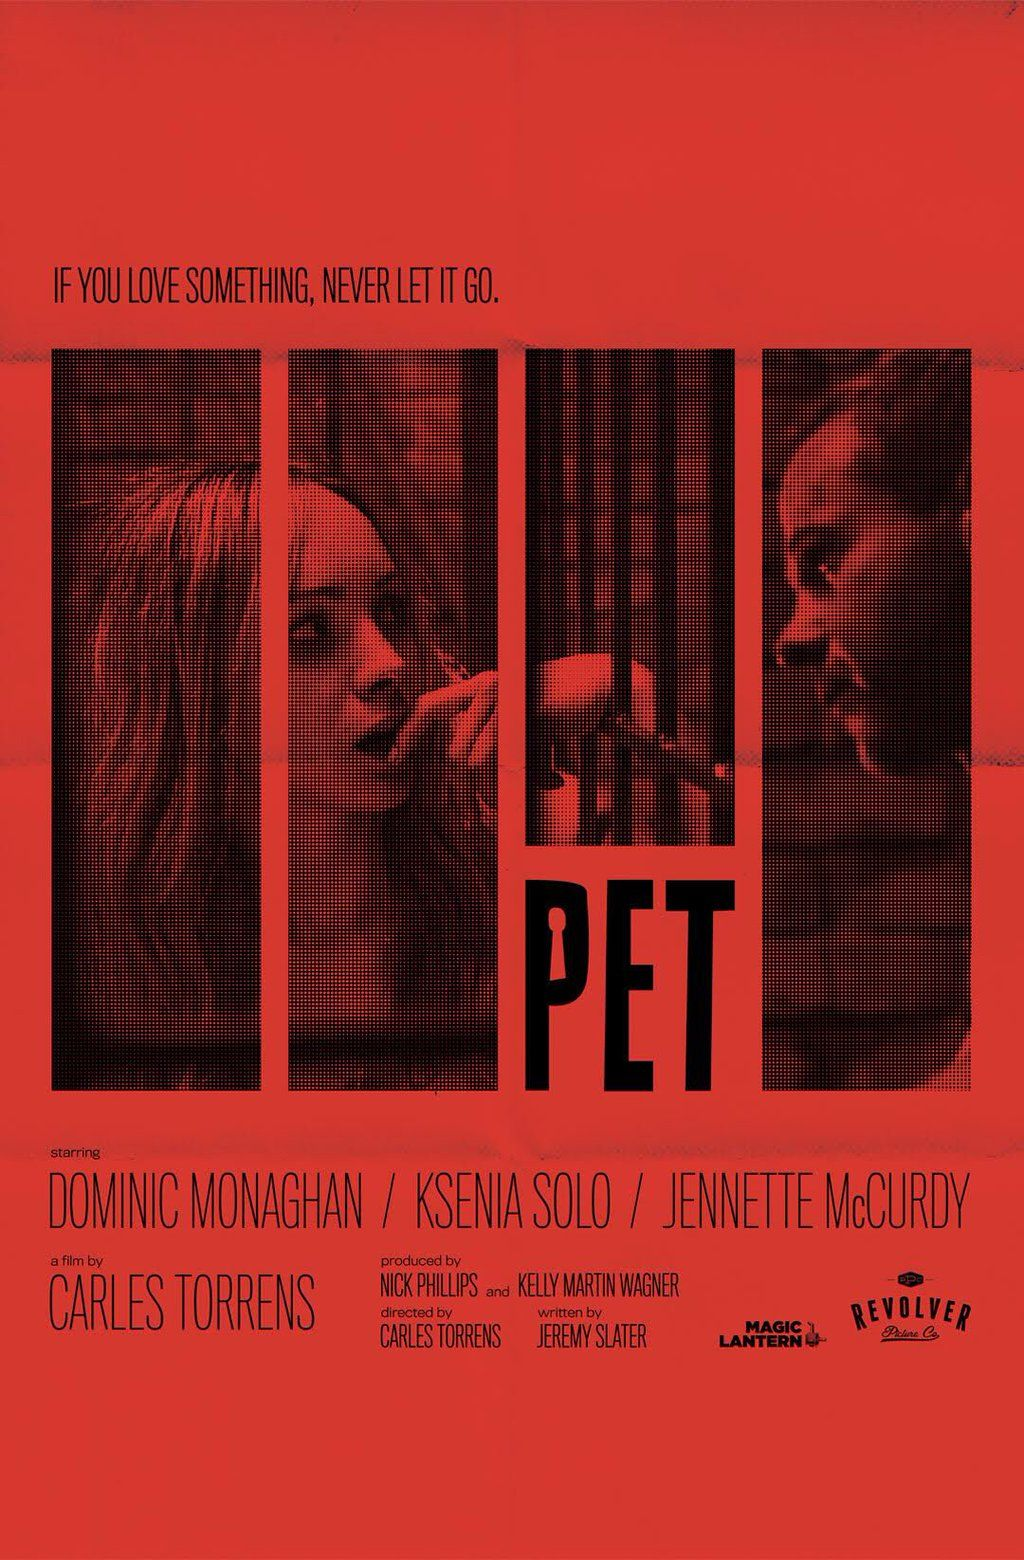 Pet (2016) Movie Pets movie, Pet 2016 movie, About time